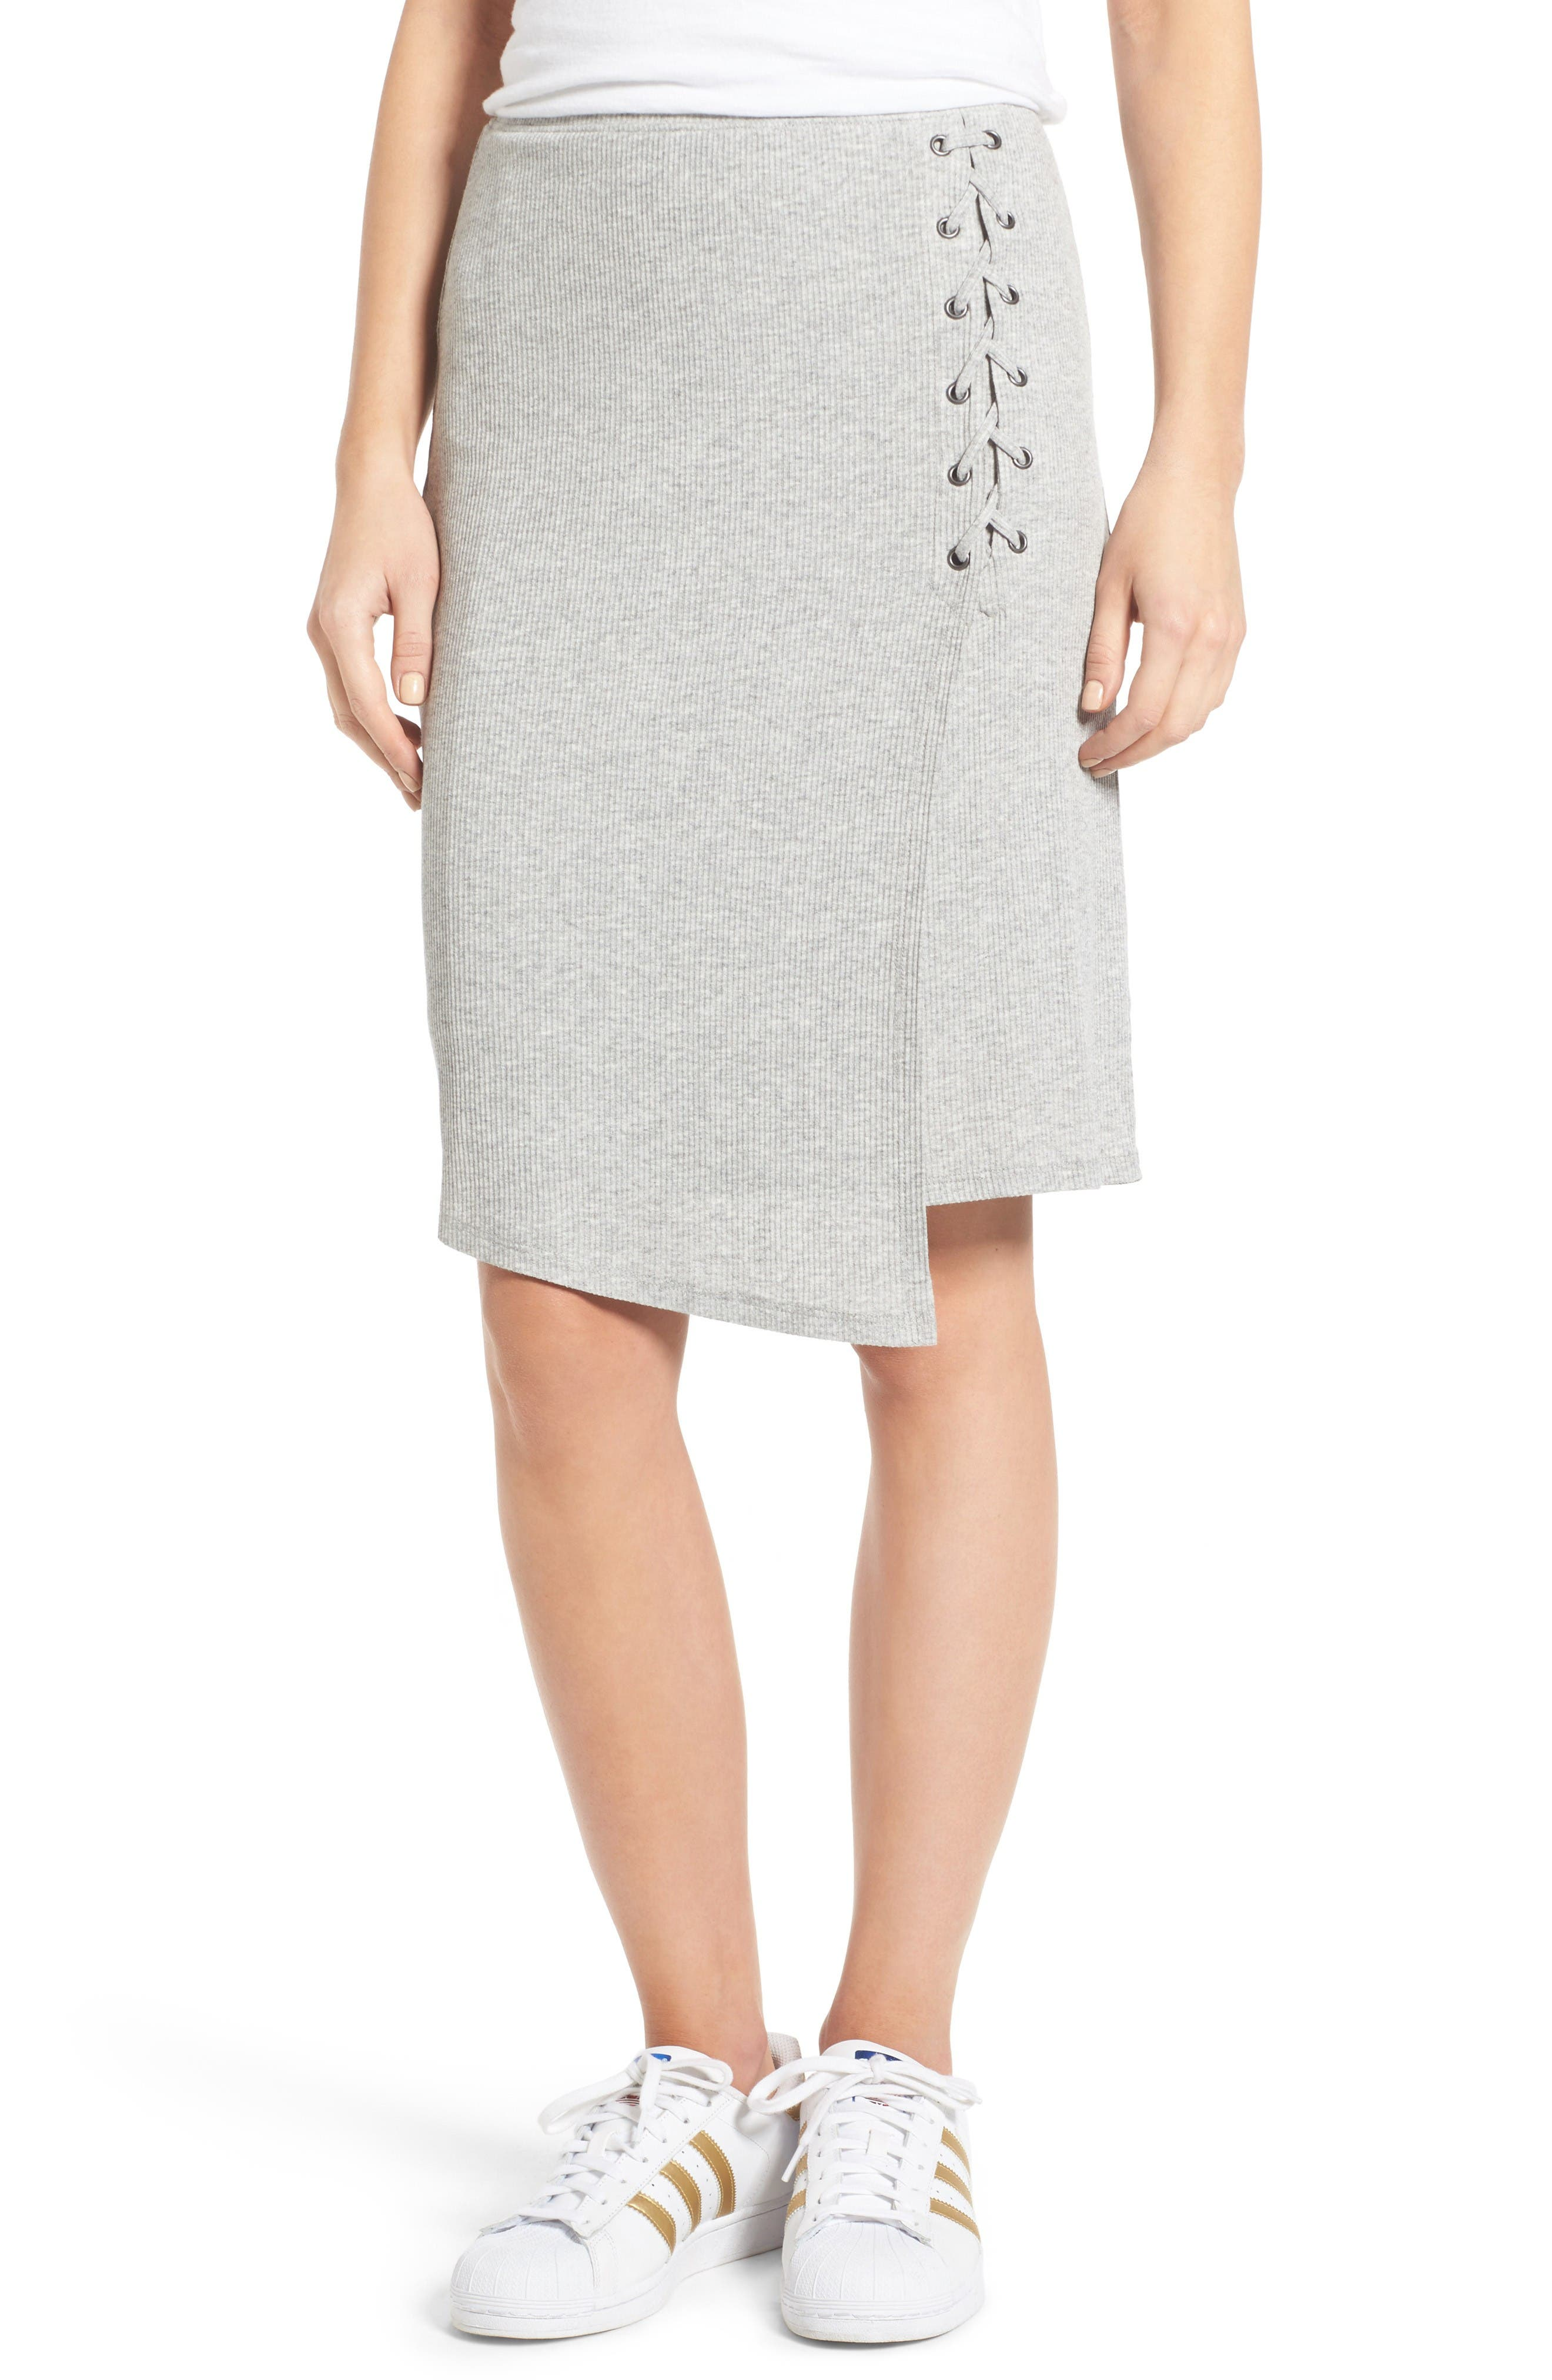 Splendid Rib Knit Skirt